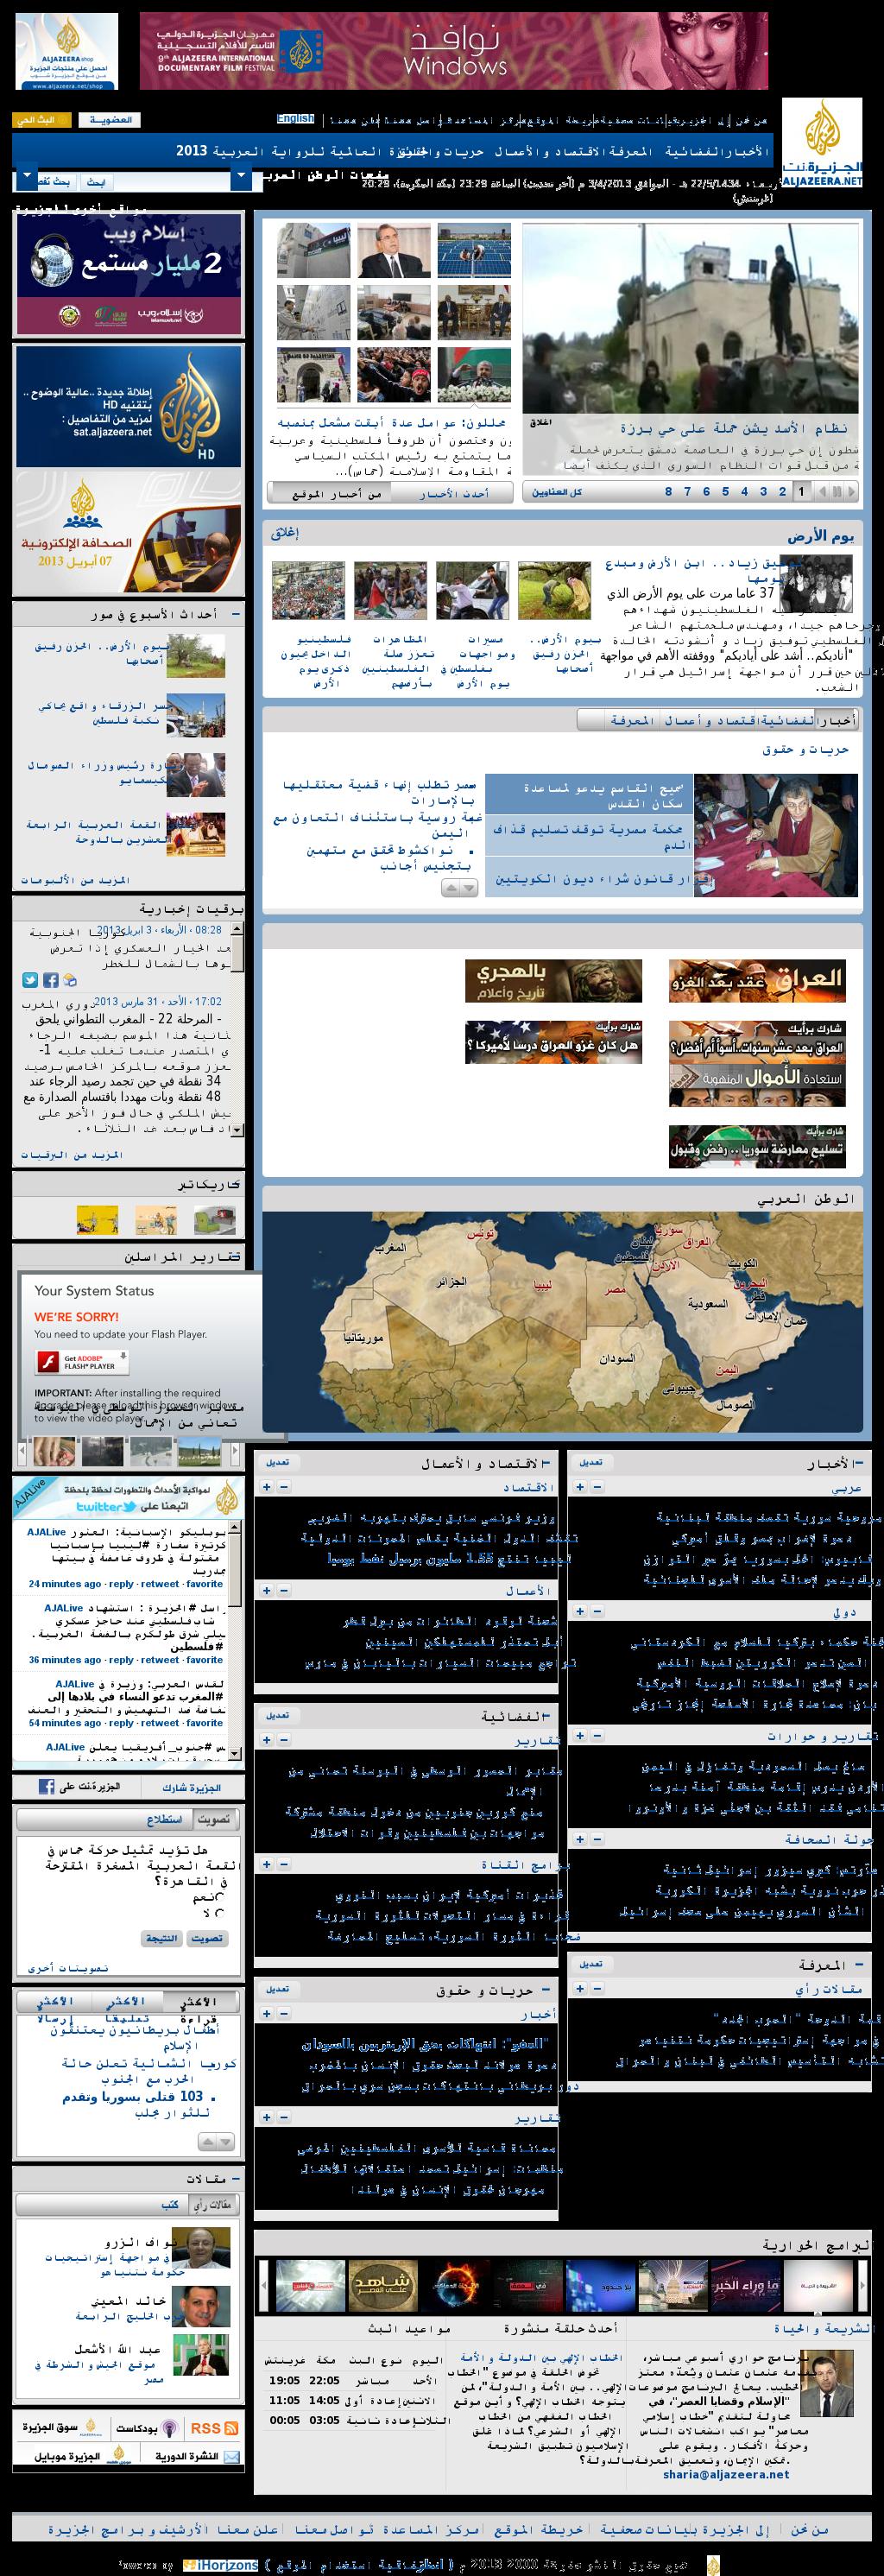 Al Jazeera at Wednesday April 3, 2013, 9:09 p.m. UTC